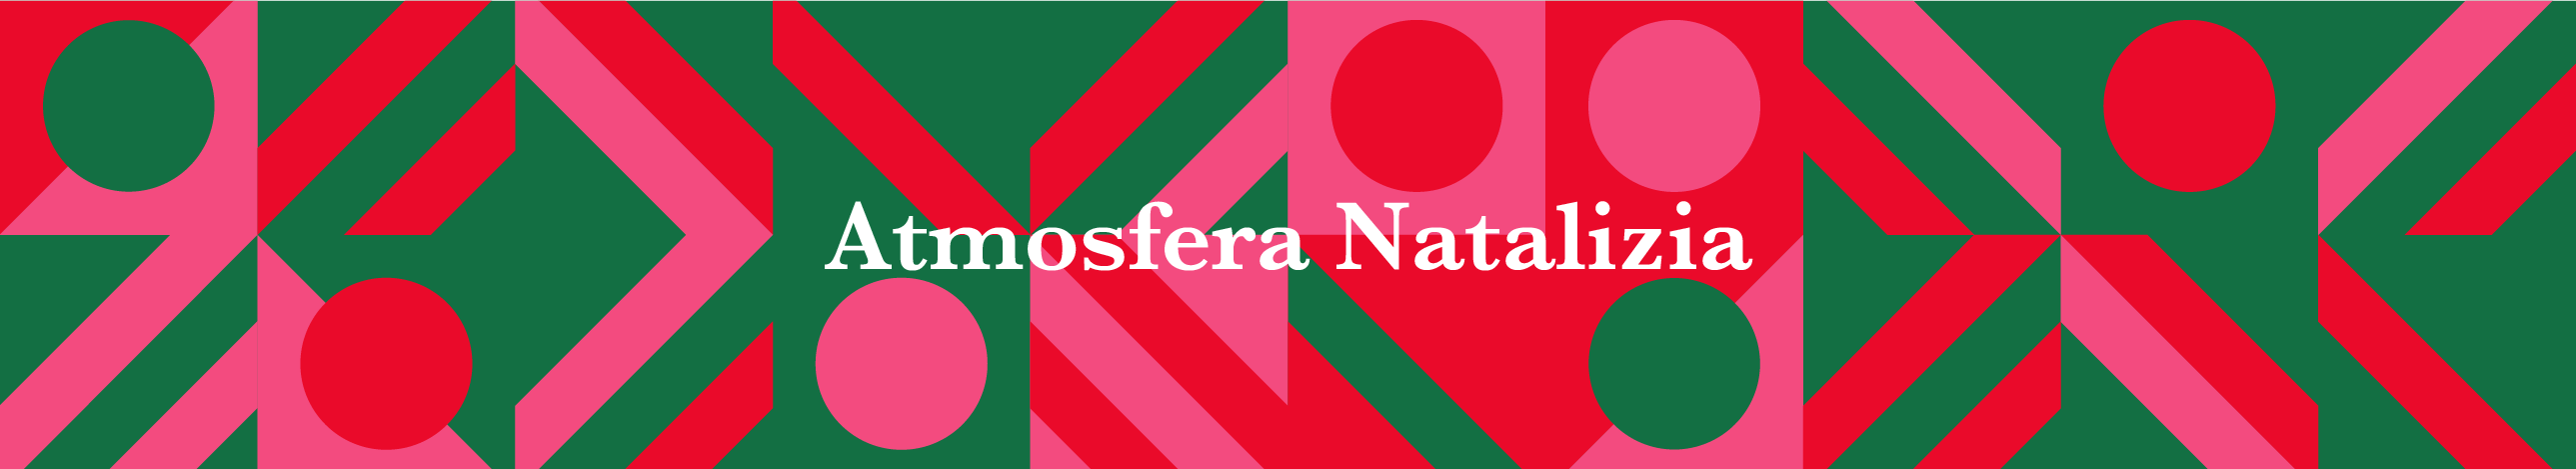 GRIFFI_NATALE_LANDING-PAGE_SEZIONE_ATMOSFERA-NATALIZIA.png